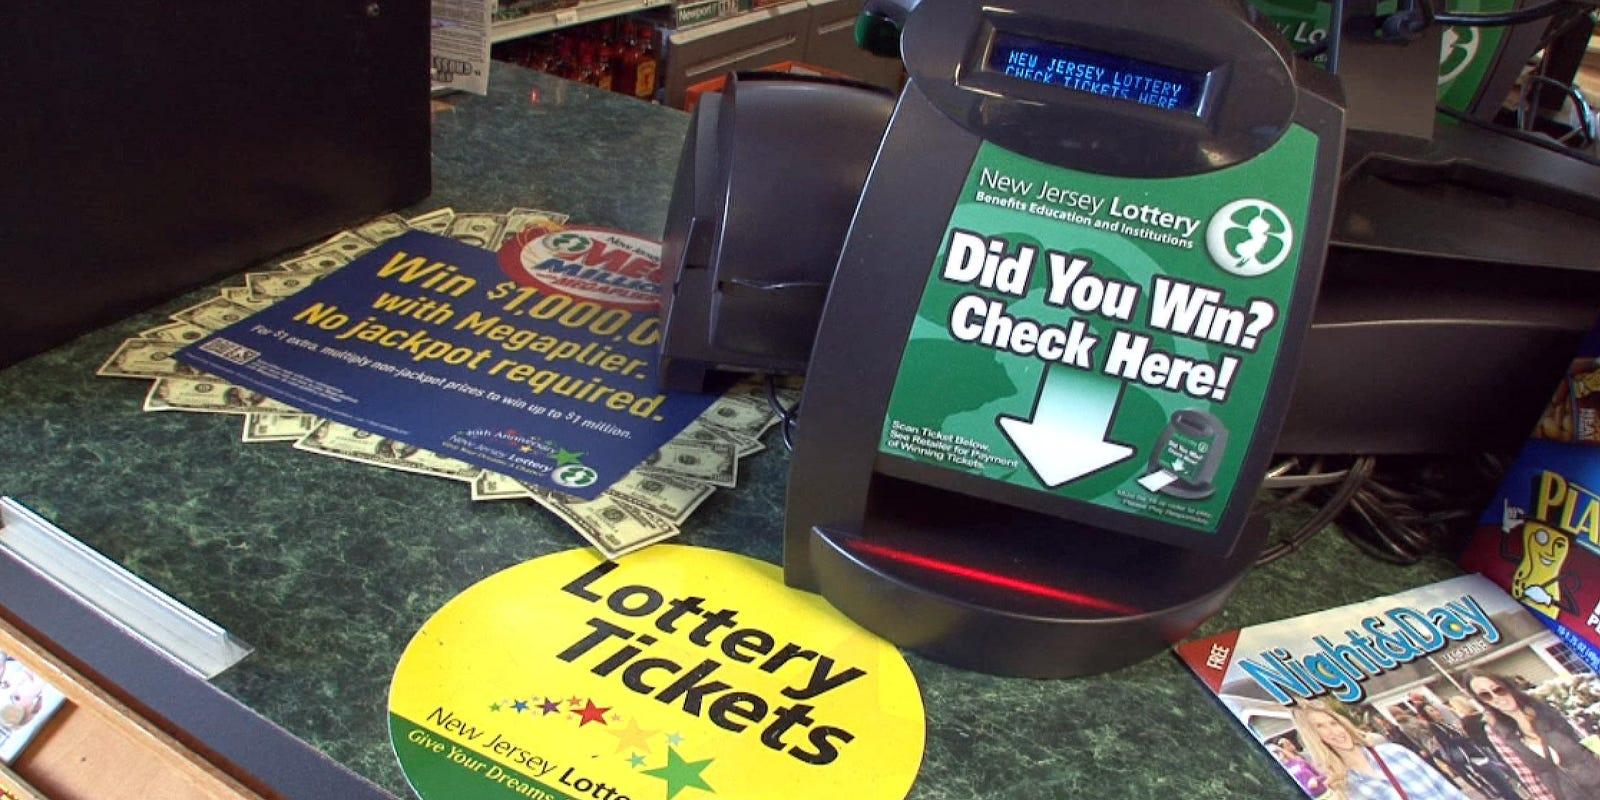 NJ Lottery: Powerball ticket sold in Marlboro wins $150,000